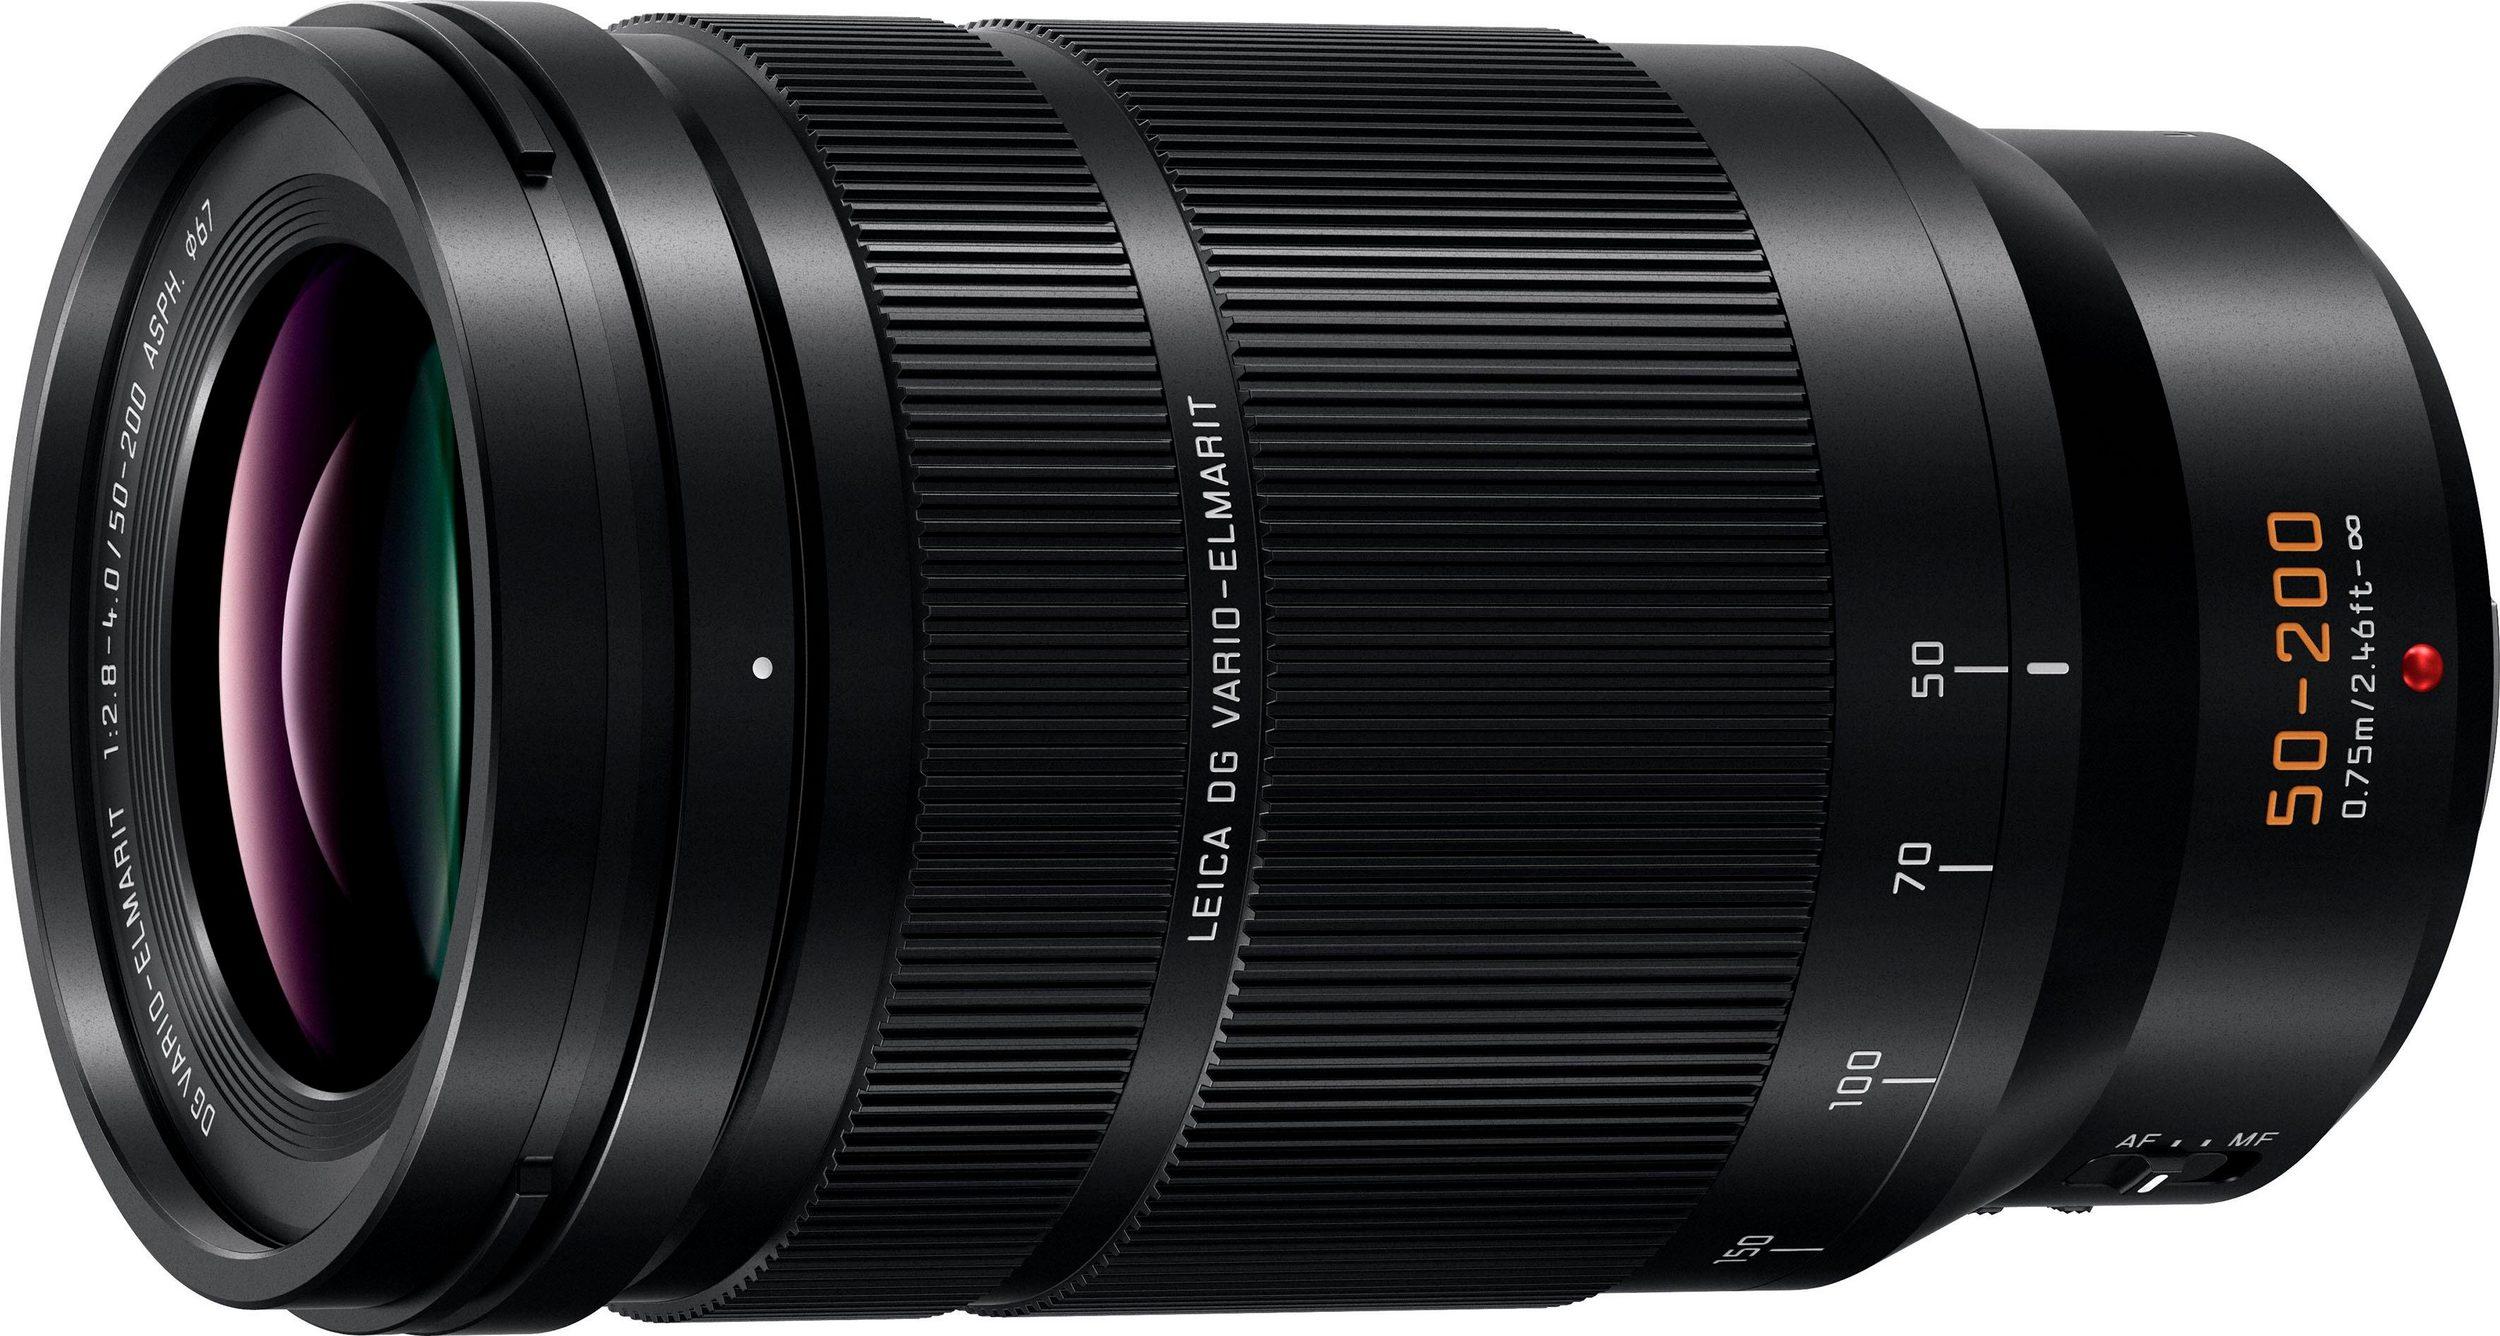 Panasonic Leica DG Vario-Elmarit 50-200 mm f2.8-4 ASPH. Mft Objektiv Lumix